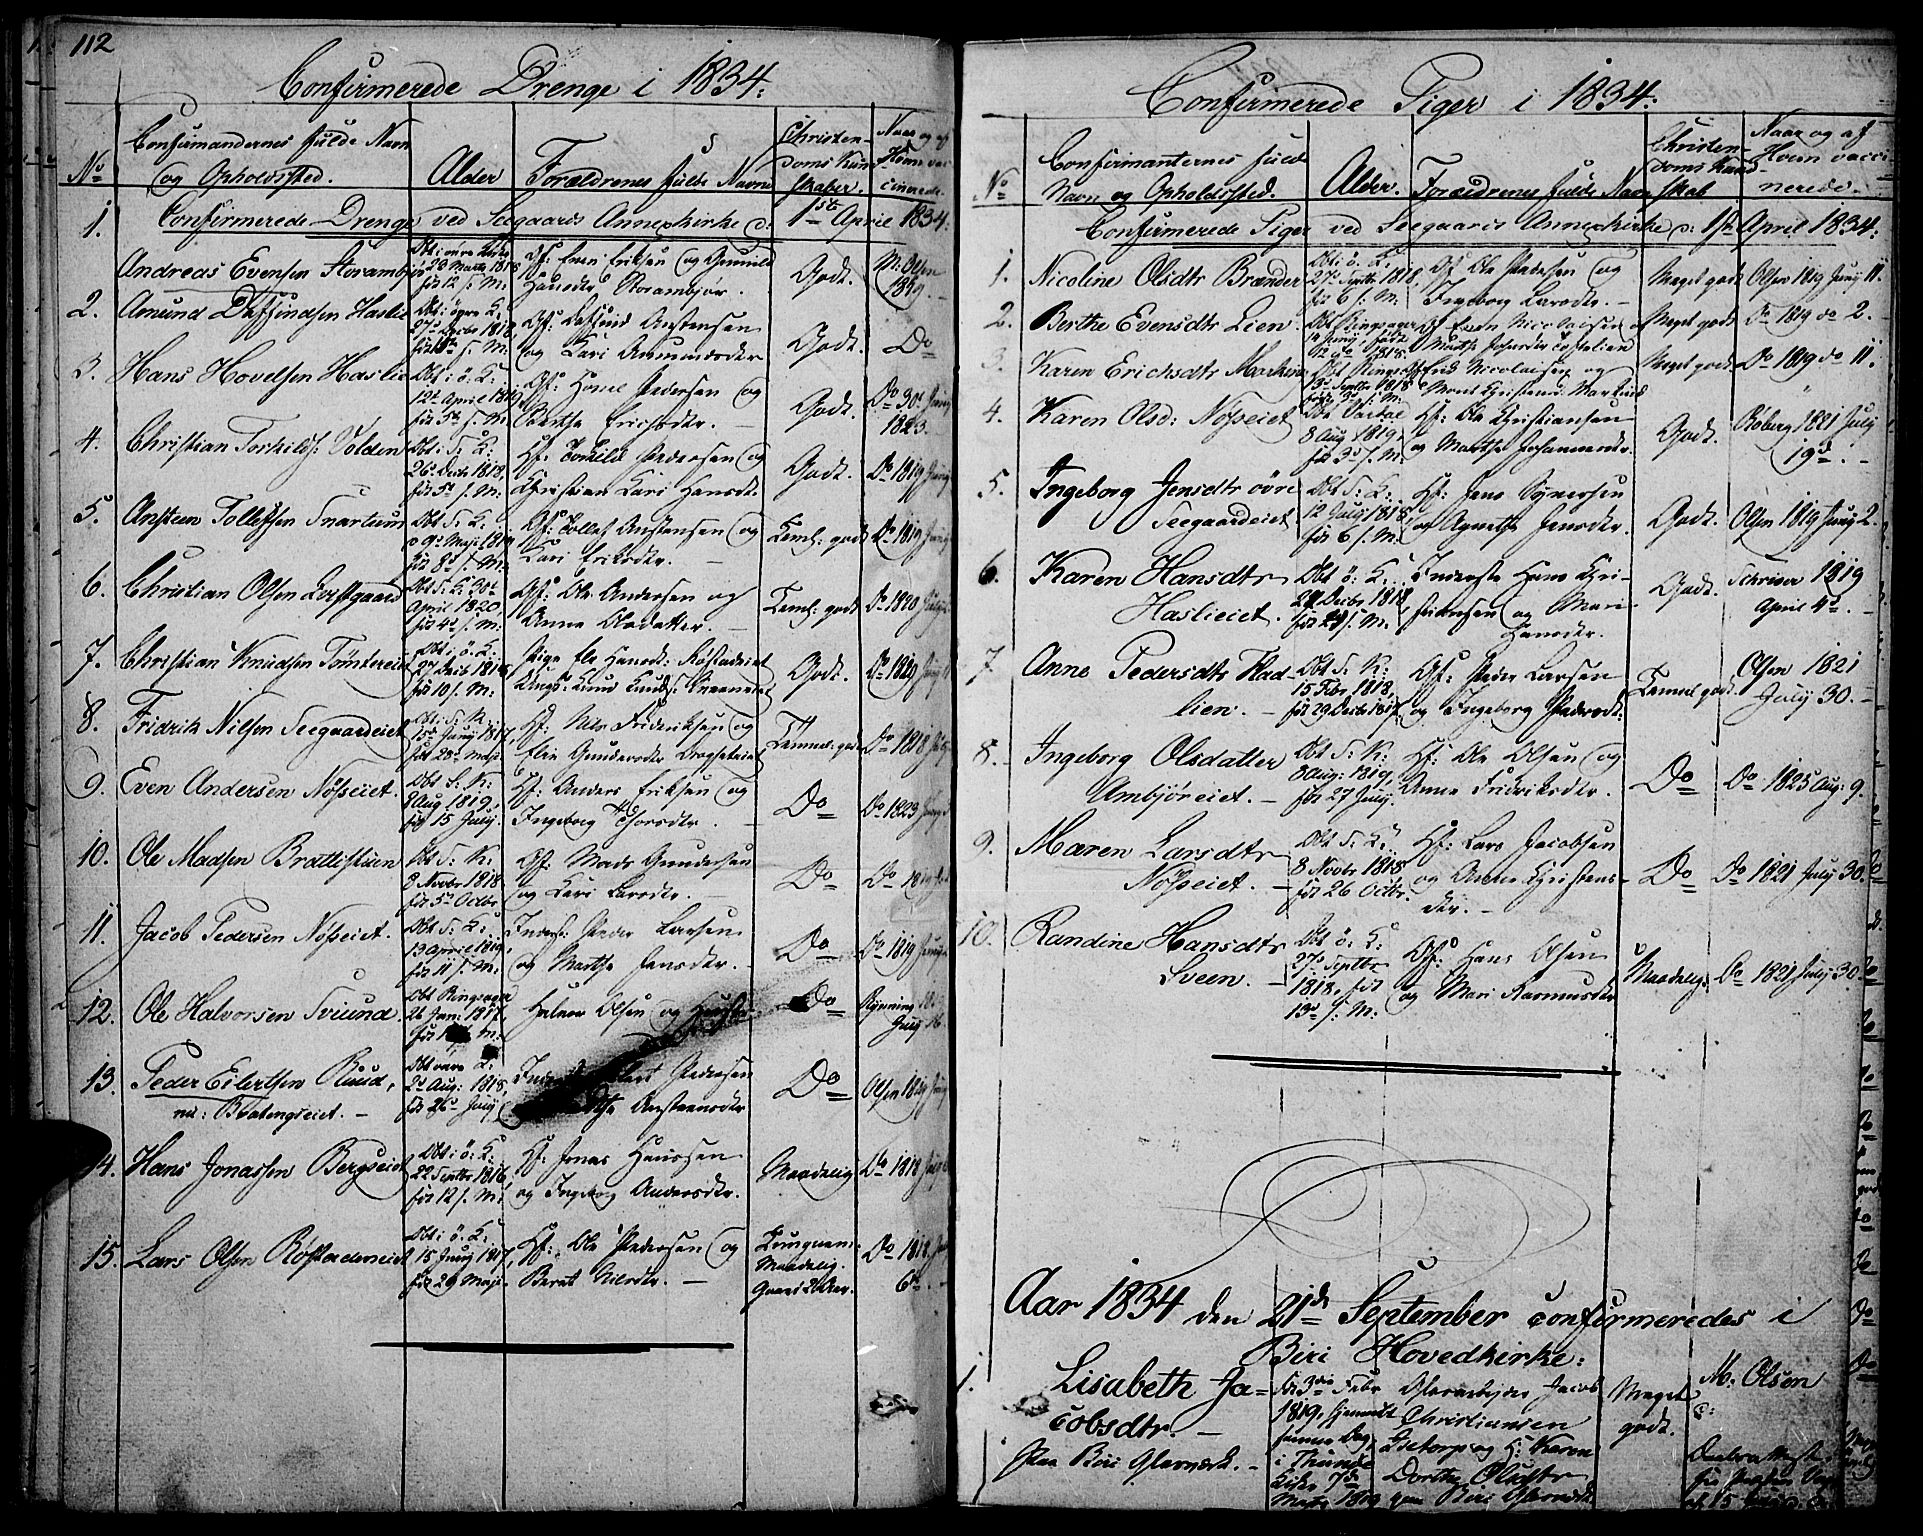 SAH, Biri prestekontor, Ministerialbok nr. 4, 1829-1842, s. 112